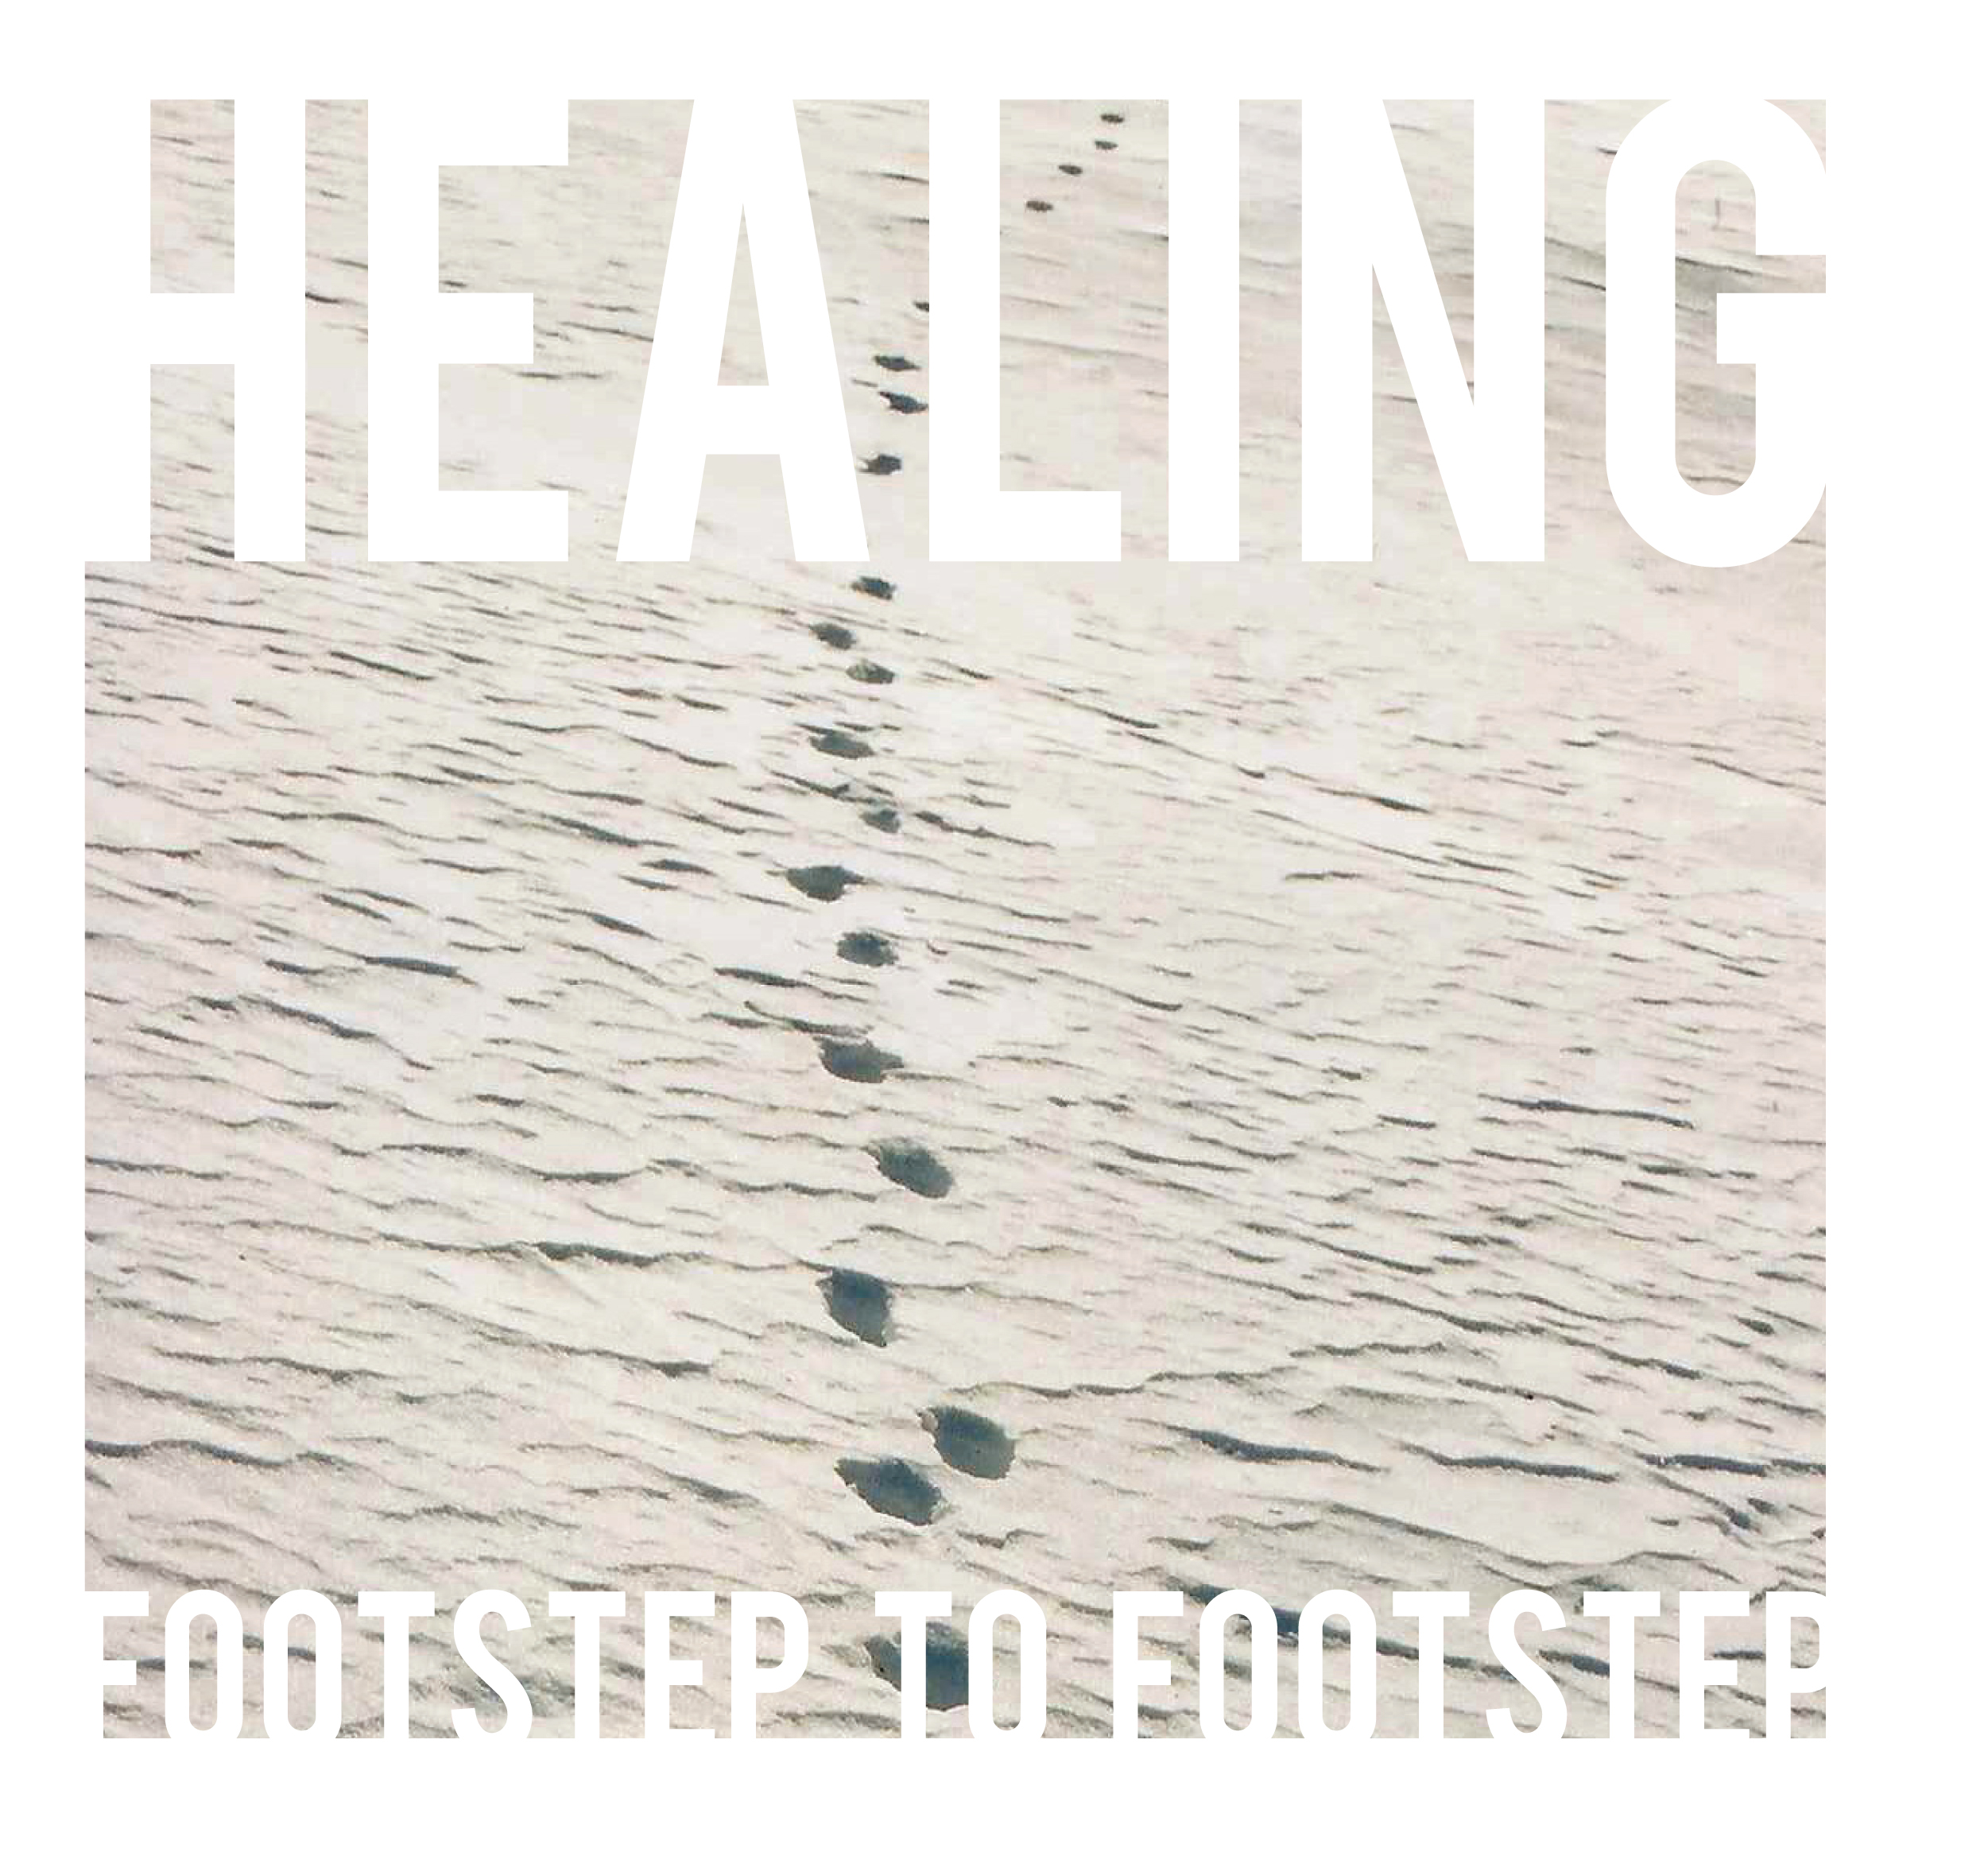 healing-fstfs_final.indd